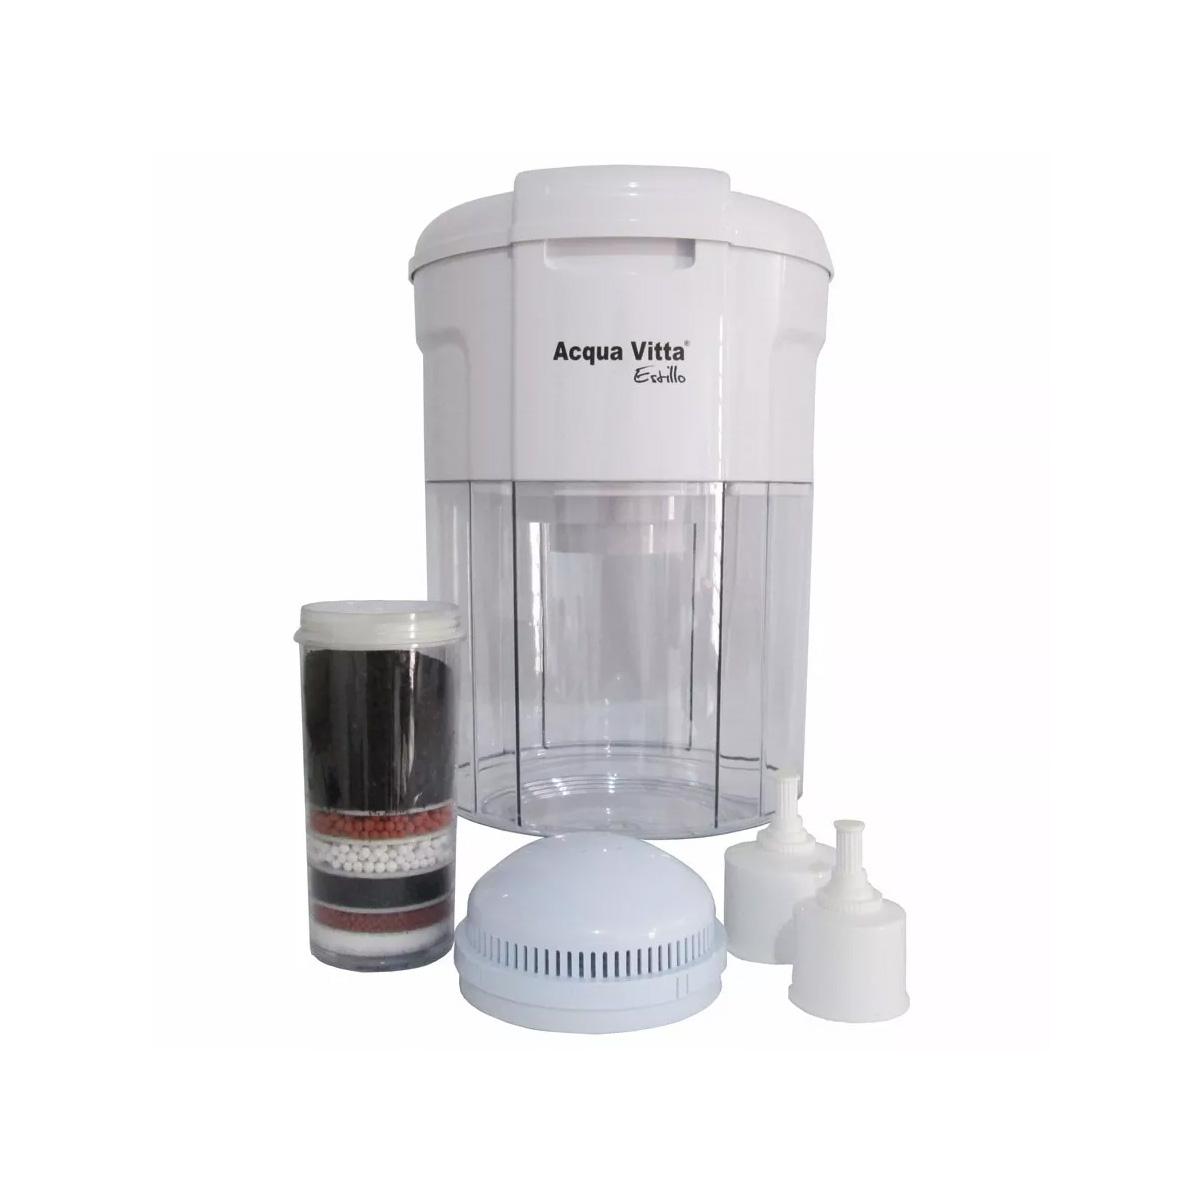 Filtro de Água Mineralizador Acqua Vitta Estillo para Bebedouros 15L